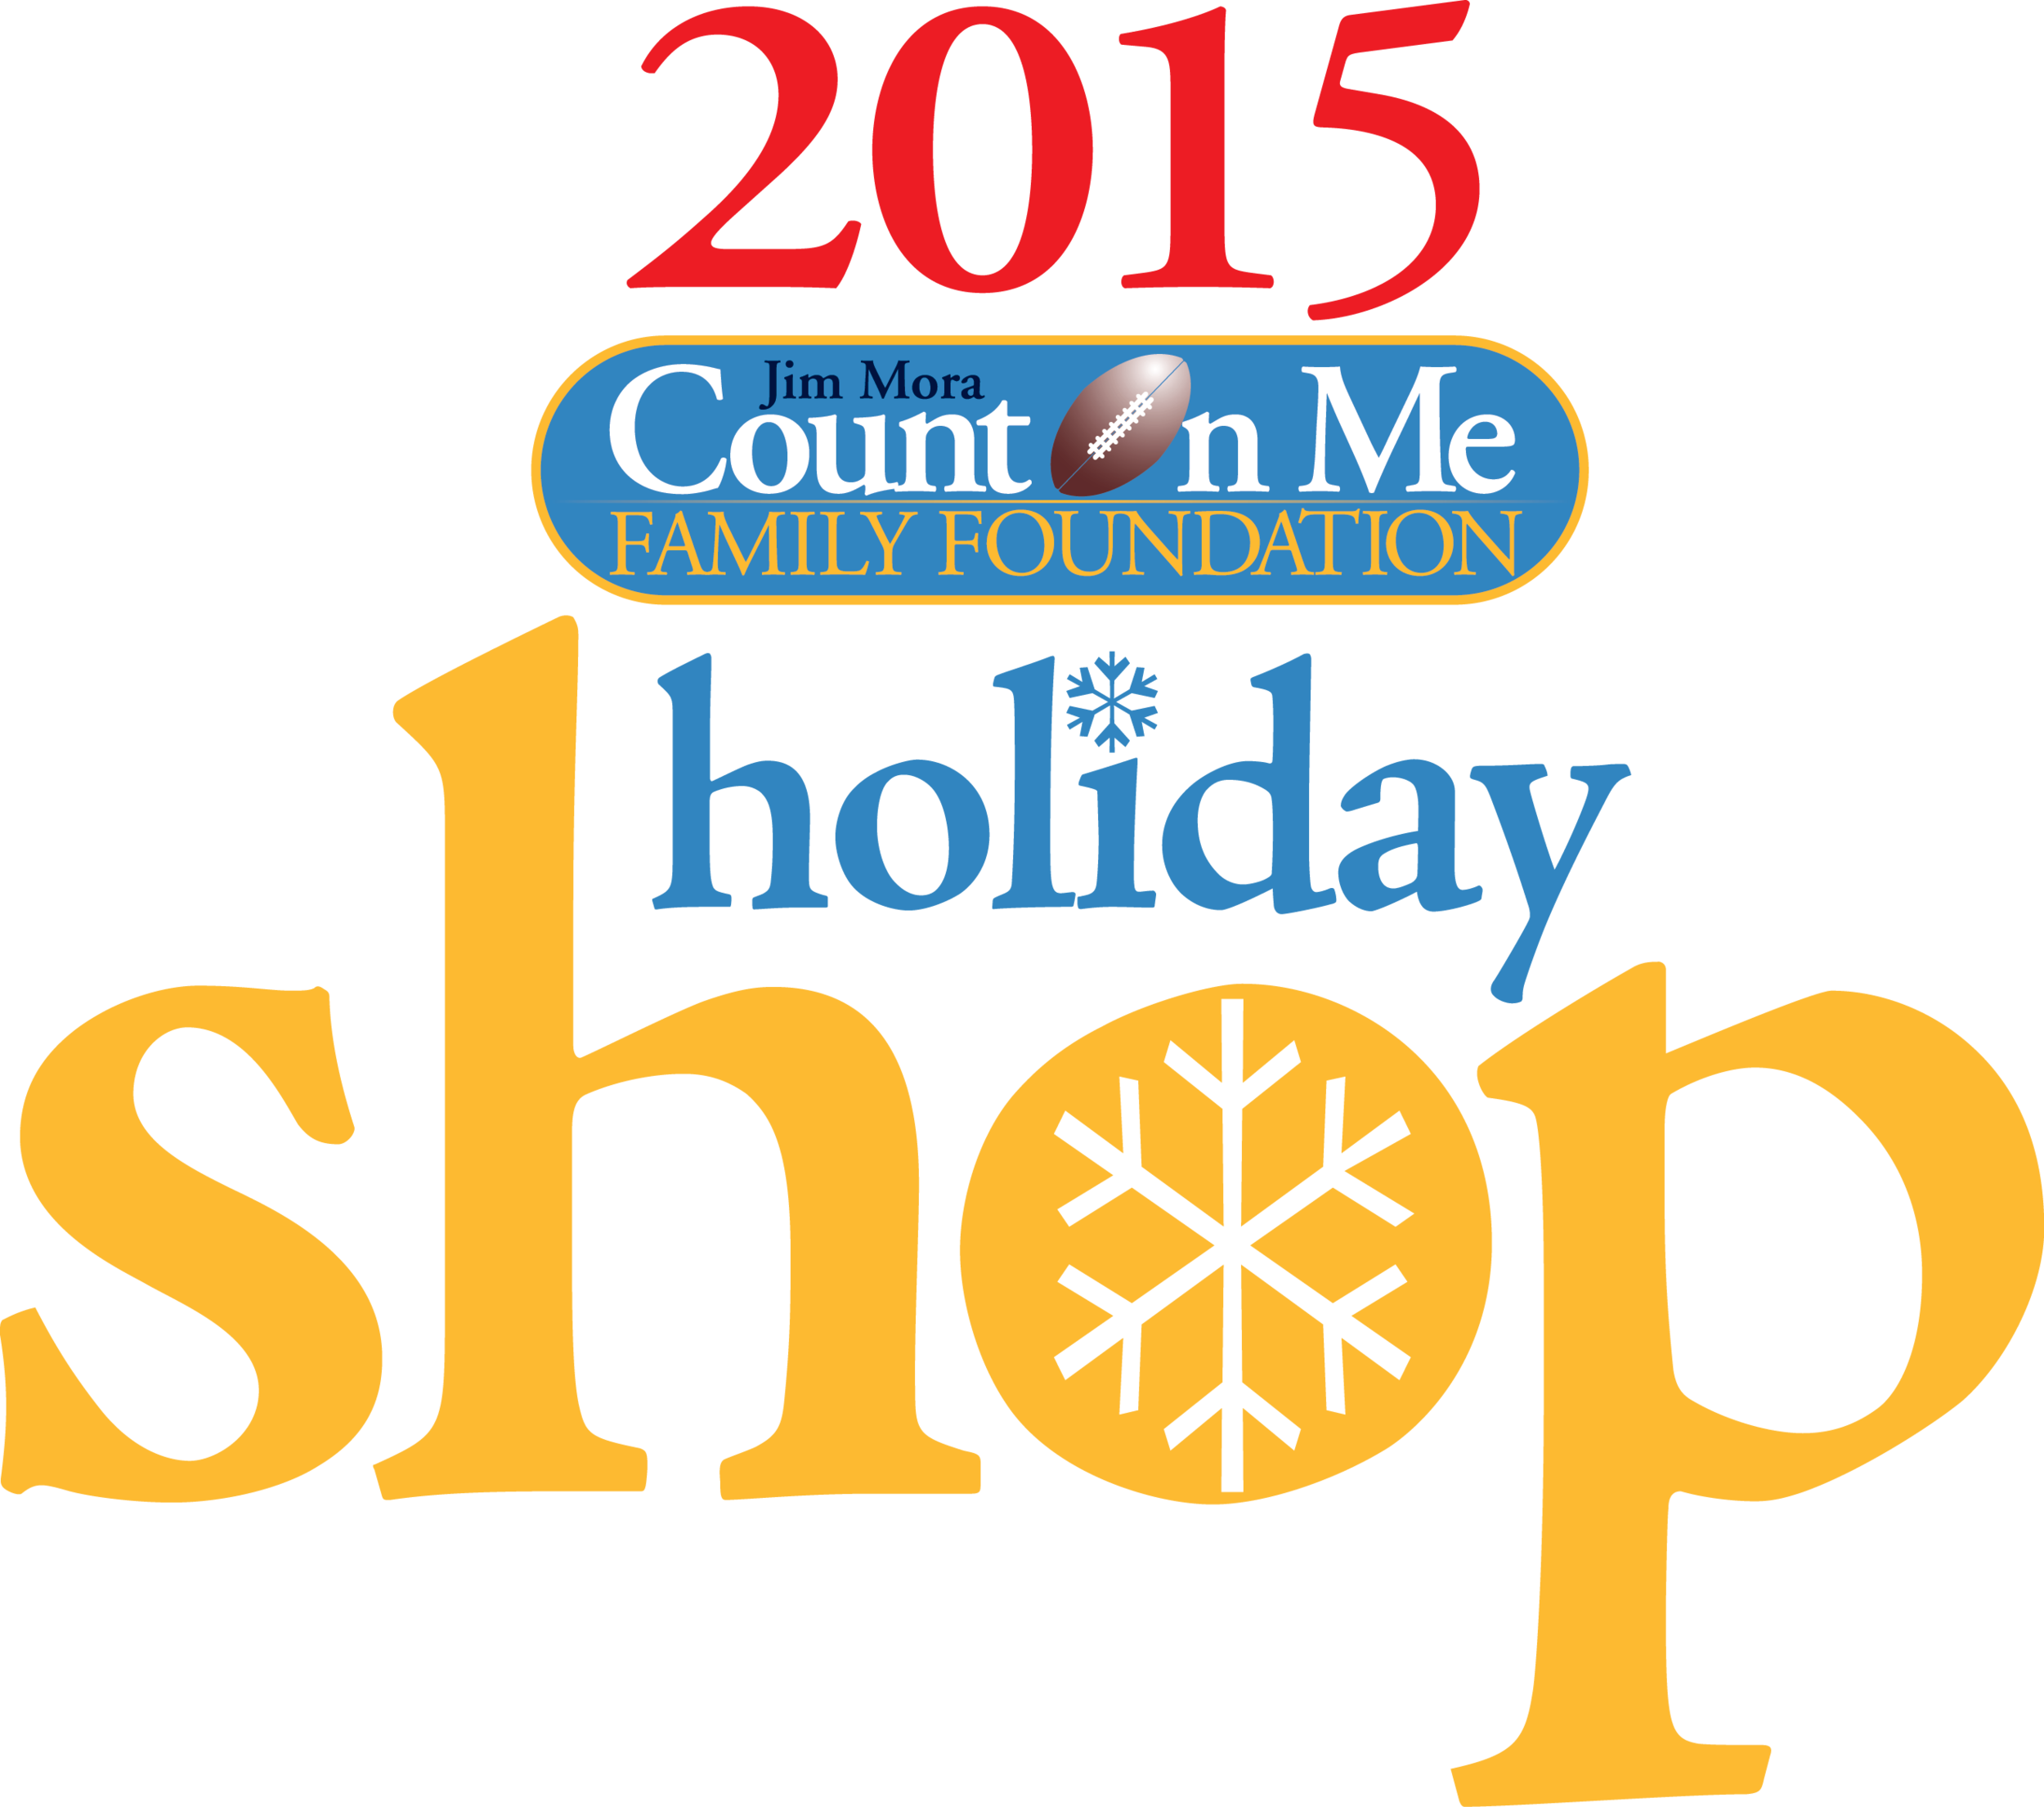 COM15_HolidayShop-base.png